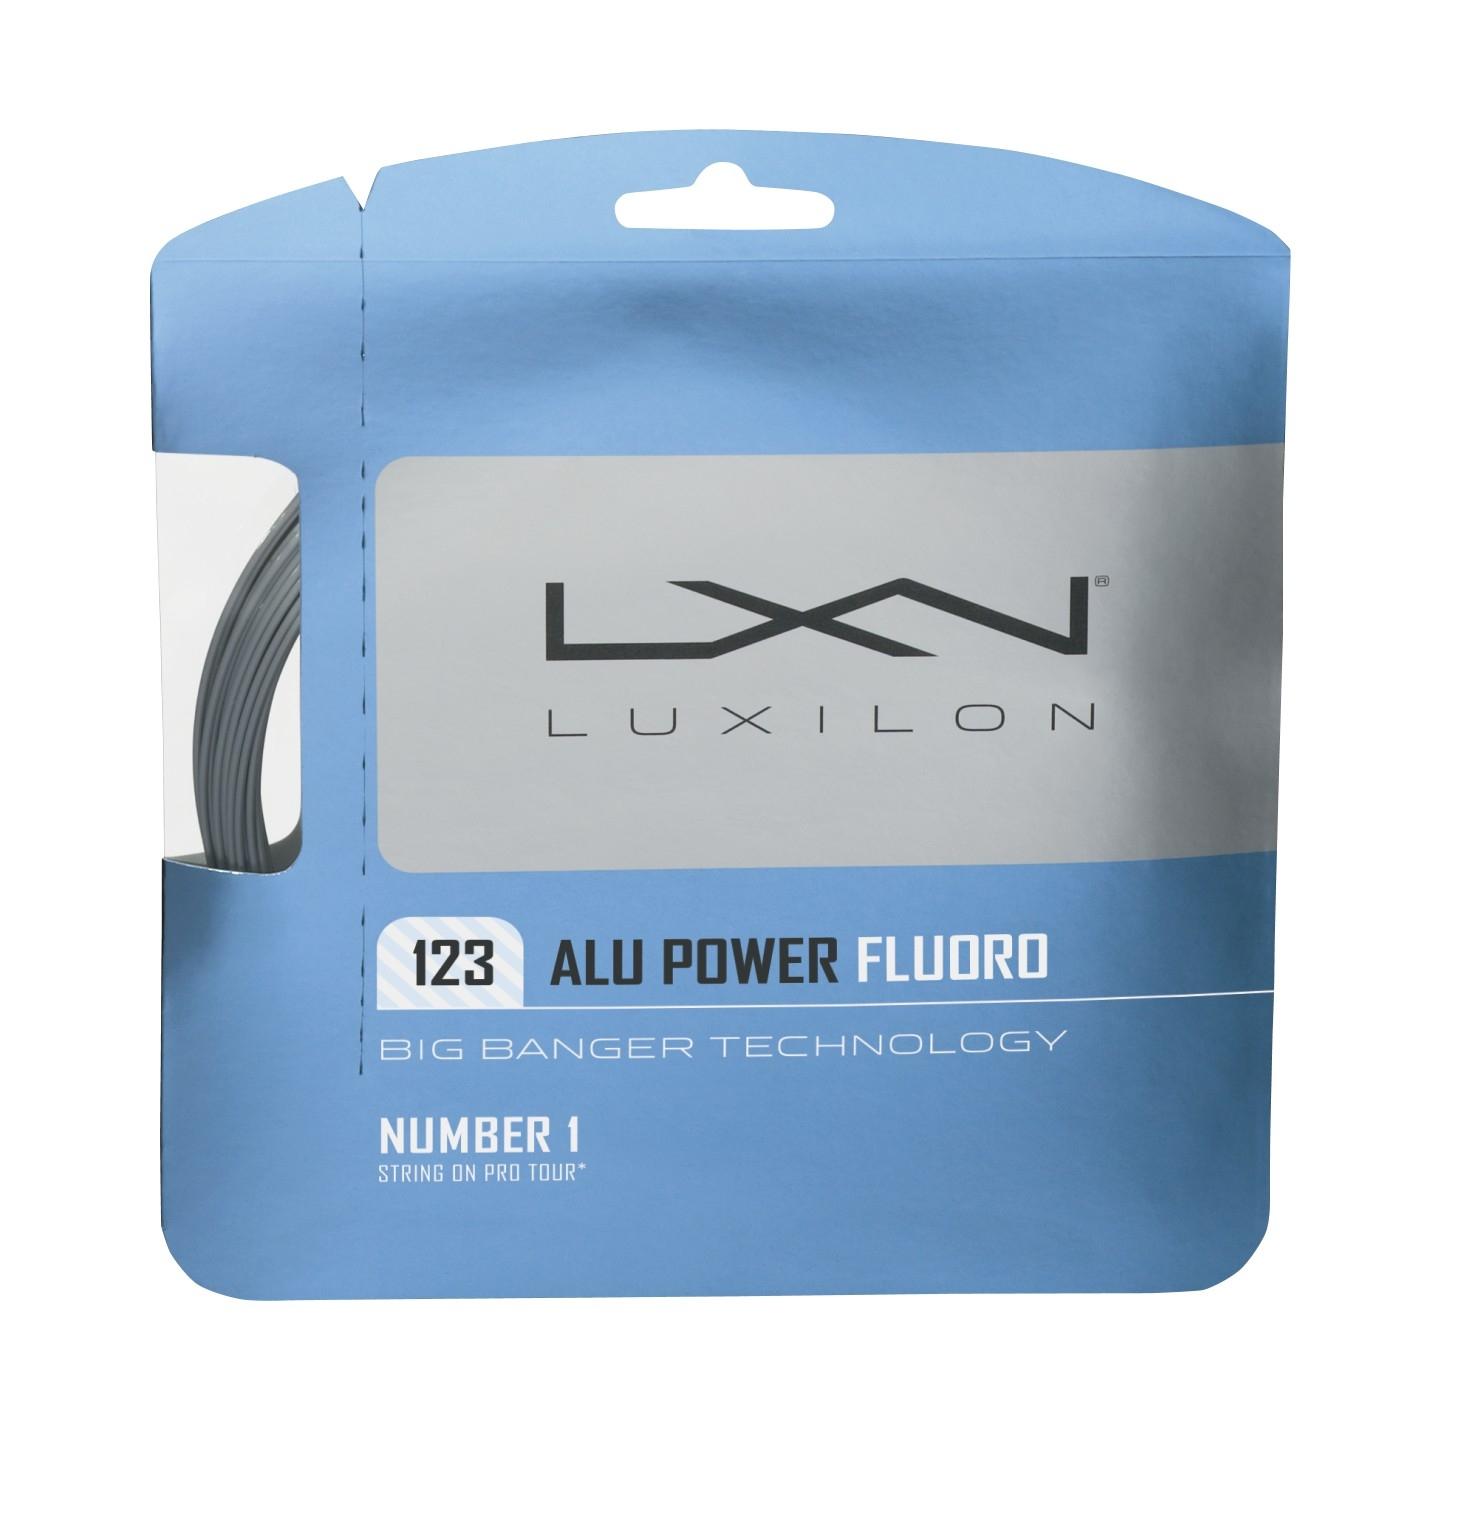 LUXILON ALU POWER FLUORO 12M